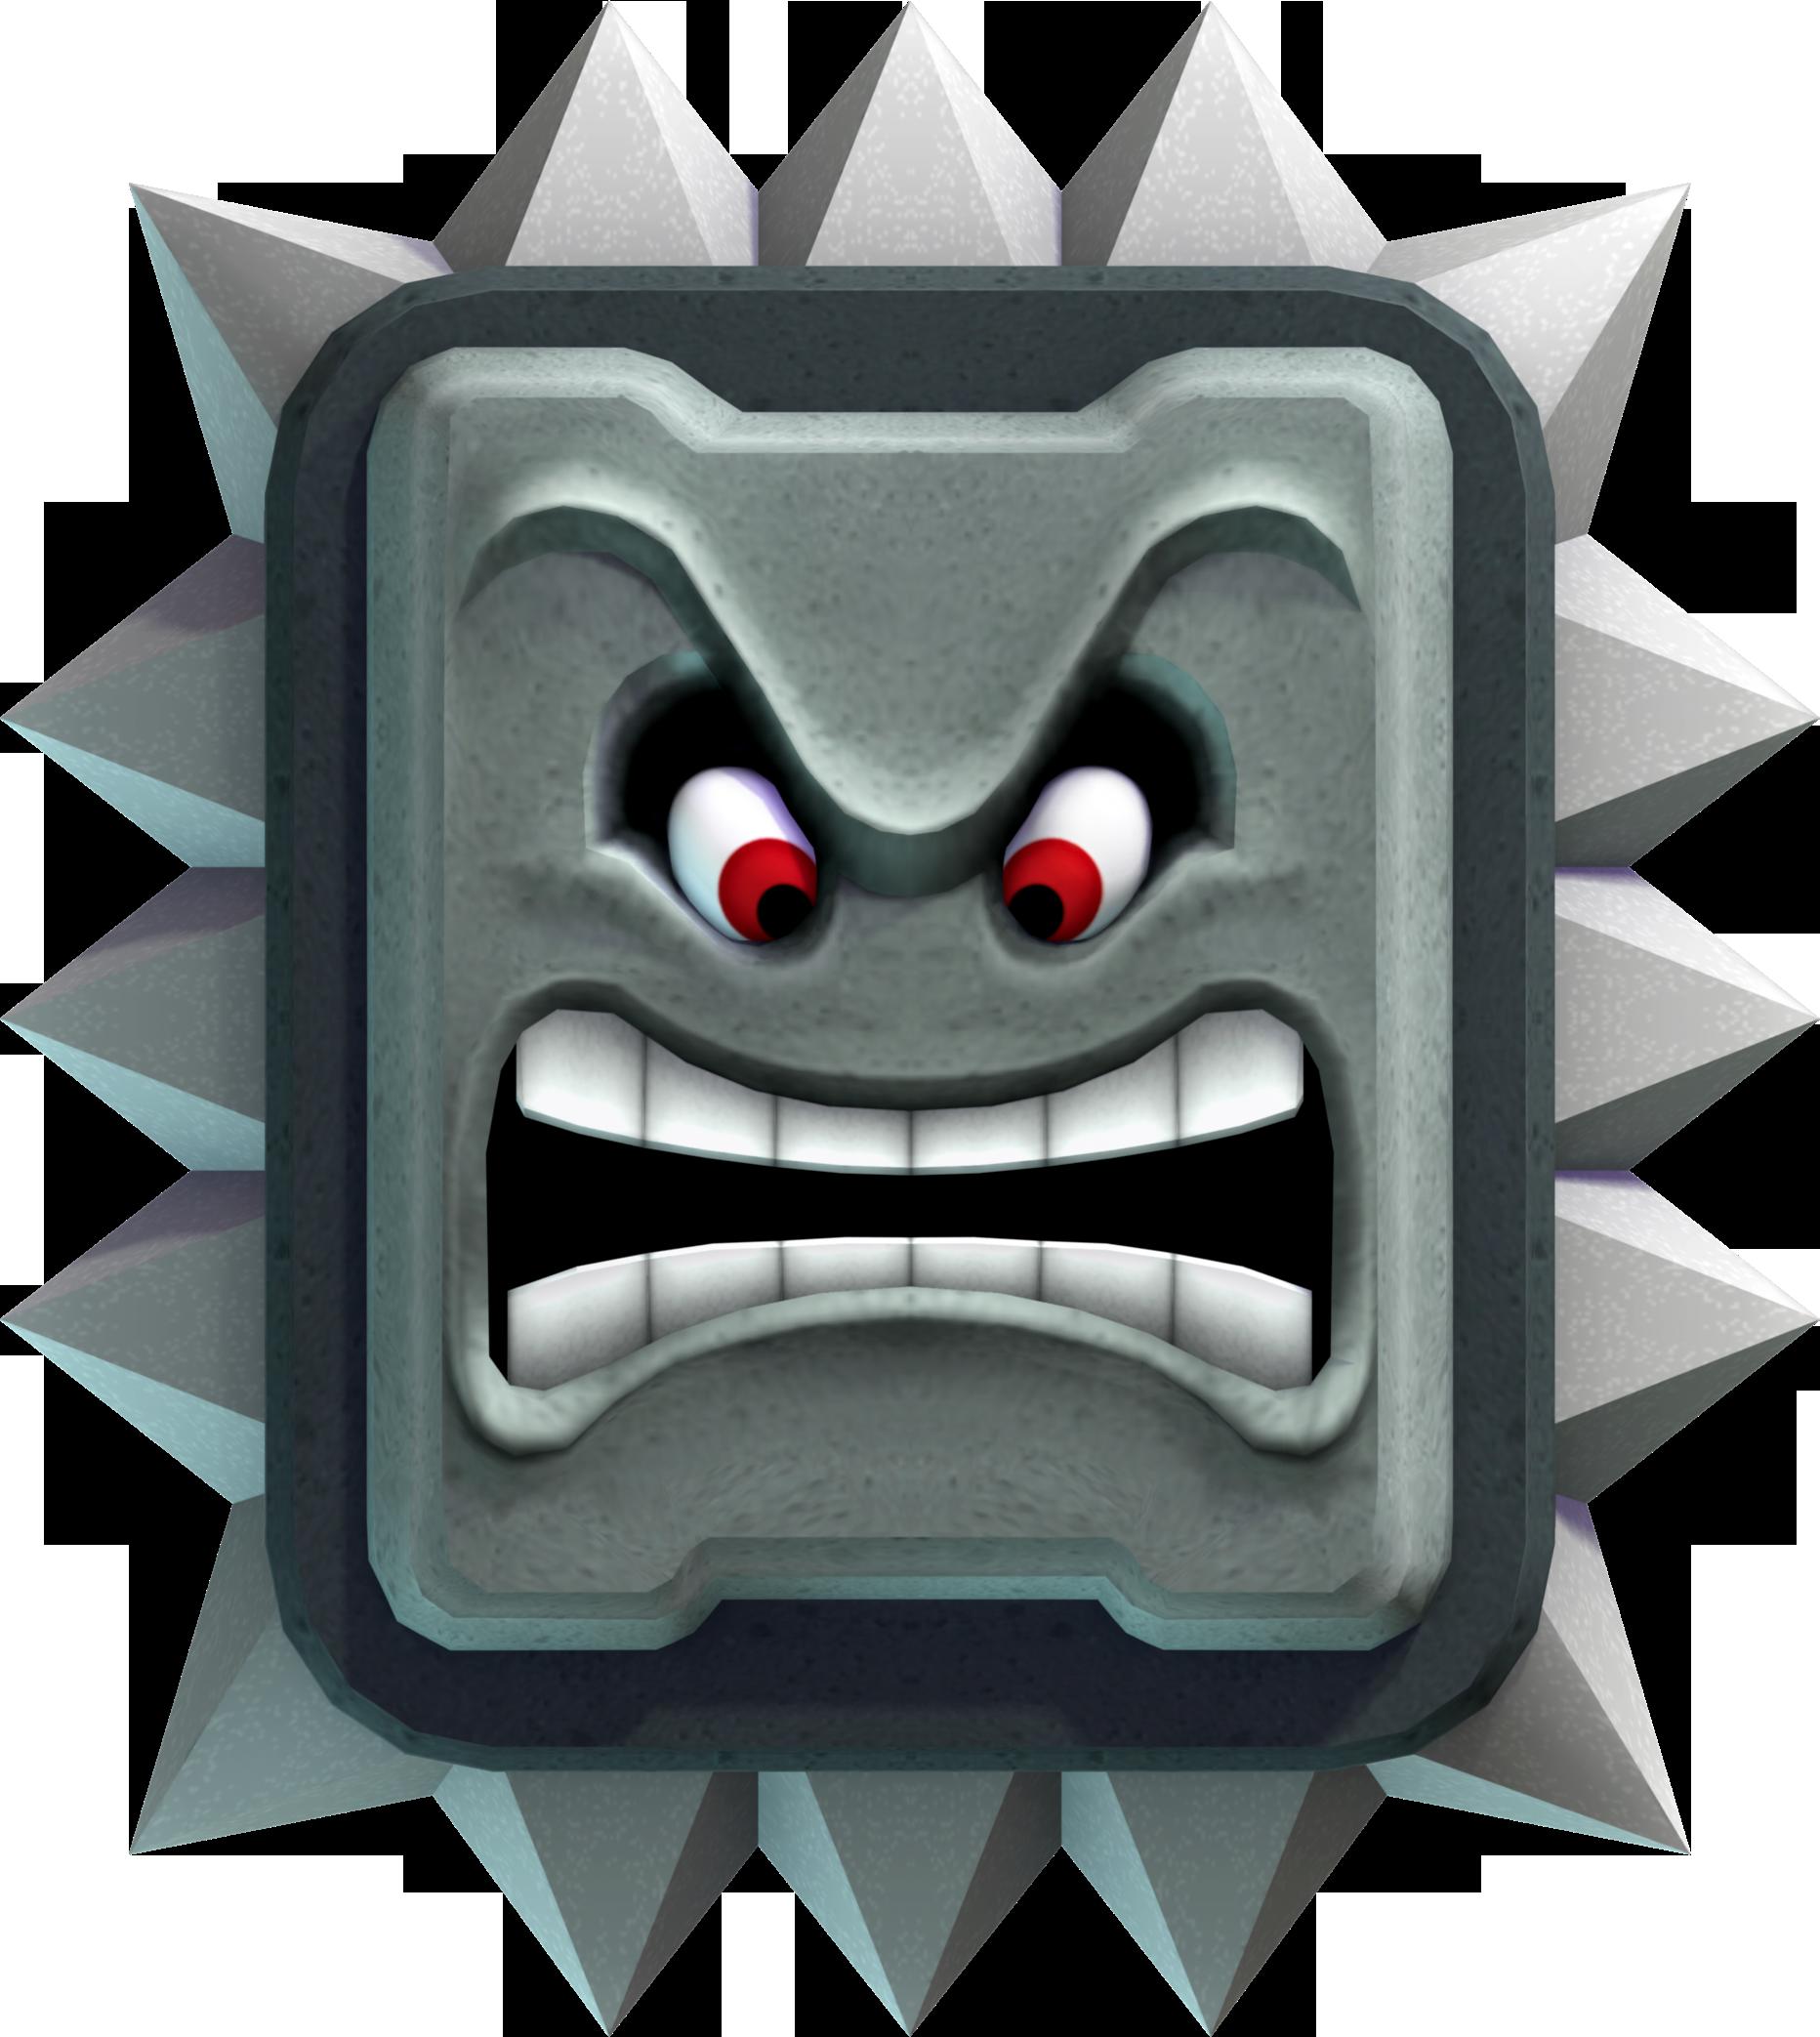 Thwomp Fantendo Nintendo Fanon Wiki Fandom Powered By Wikia